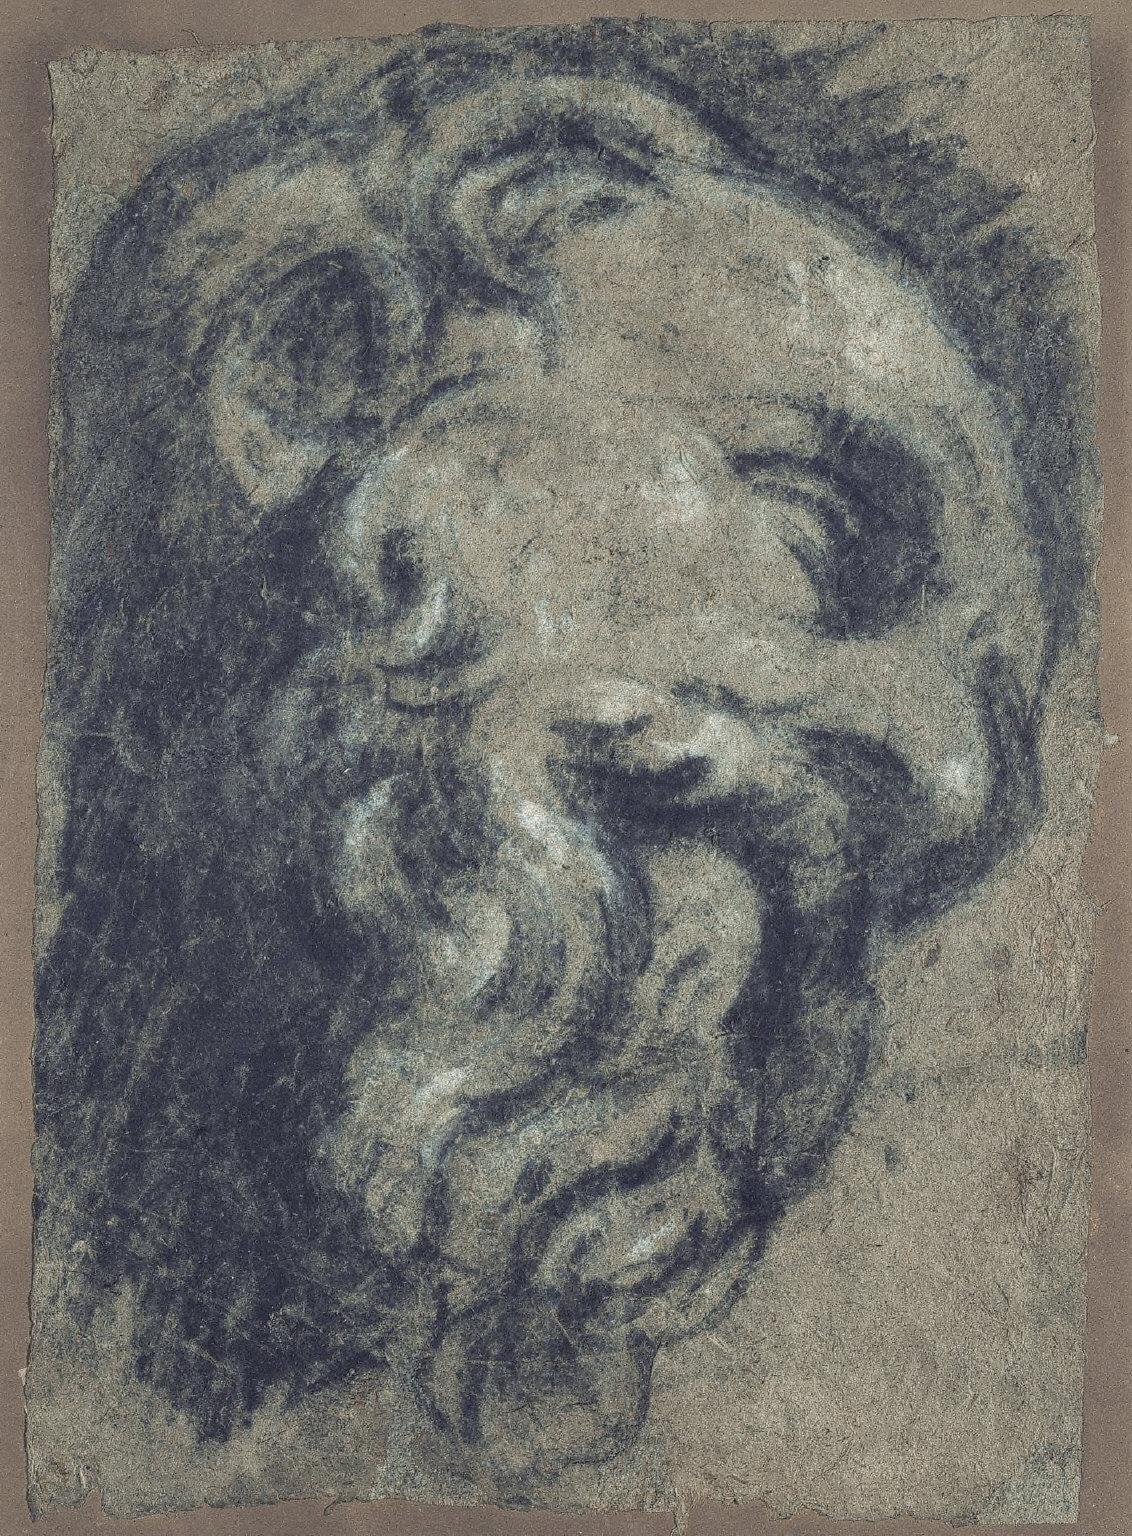 Study after Michelangelo's Saint Damian